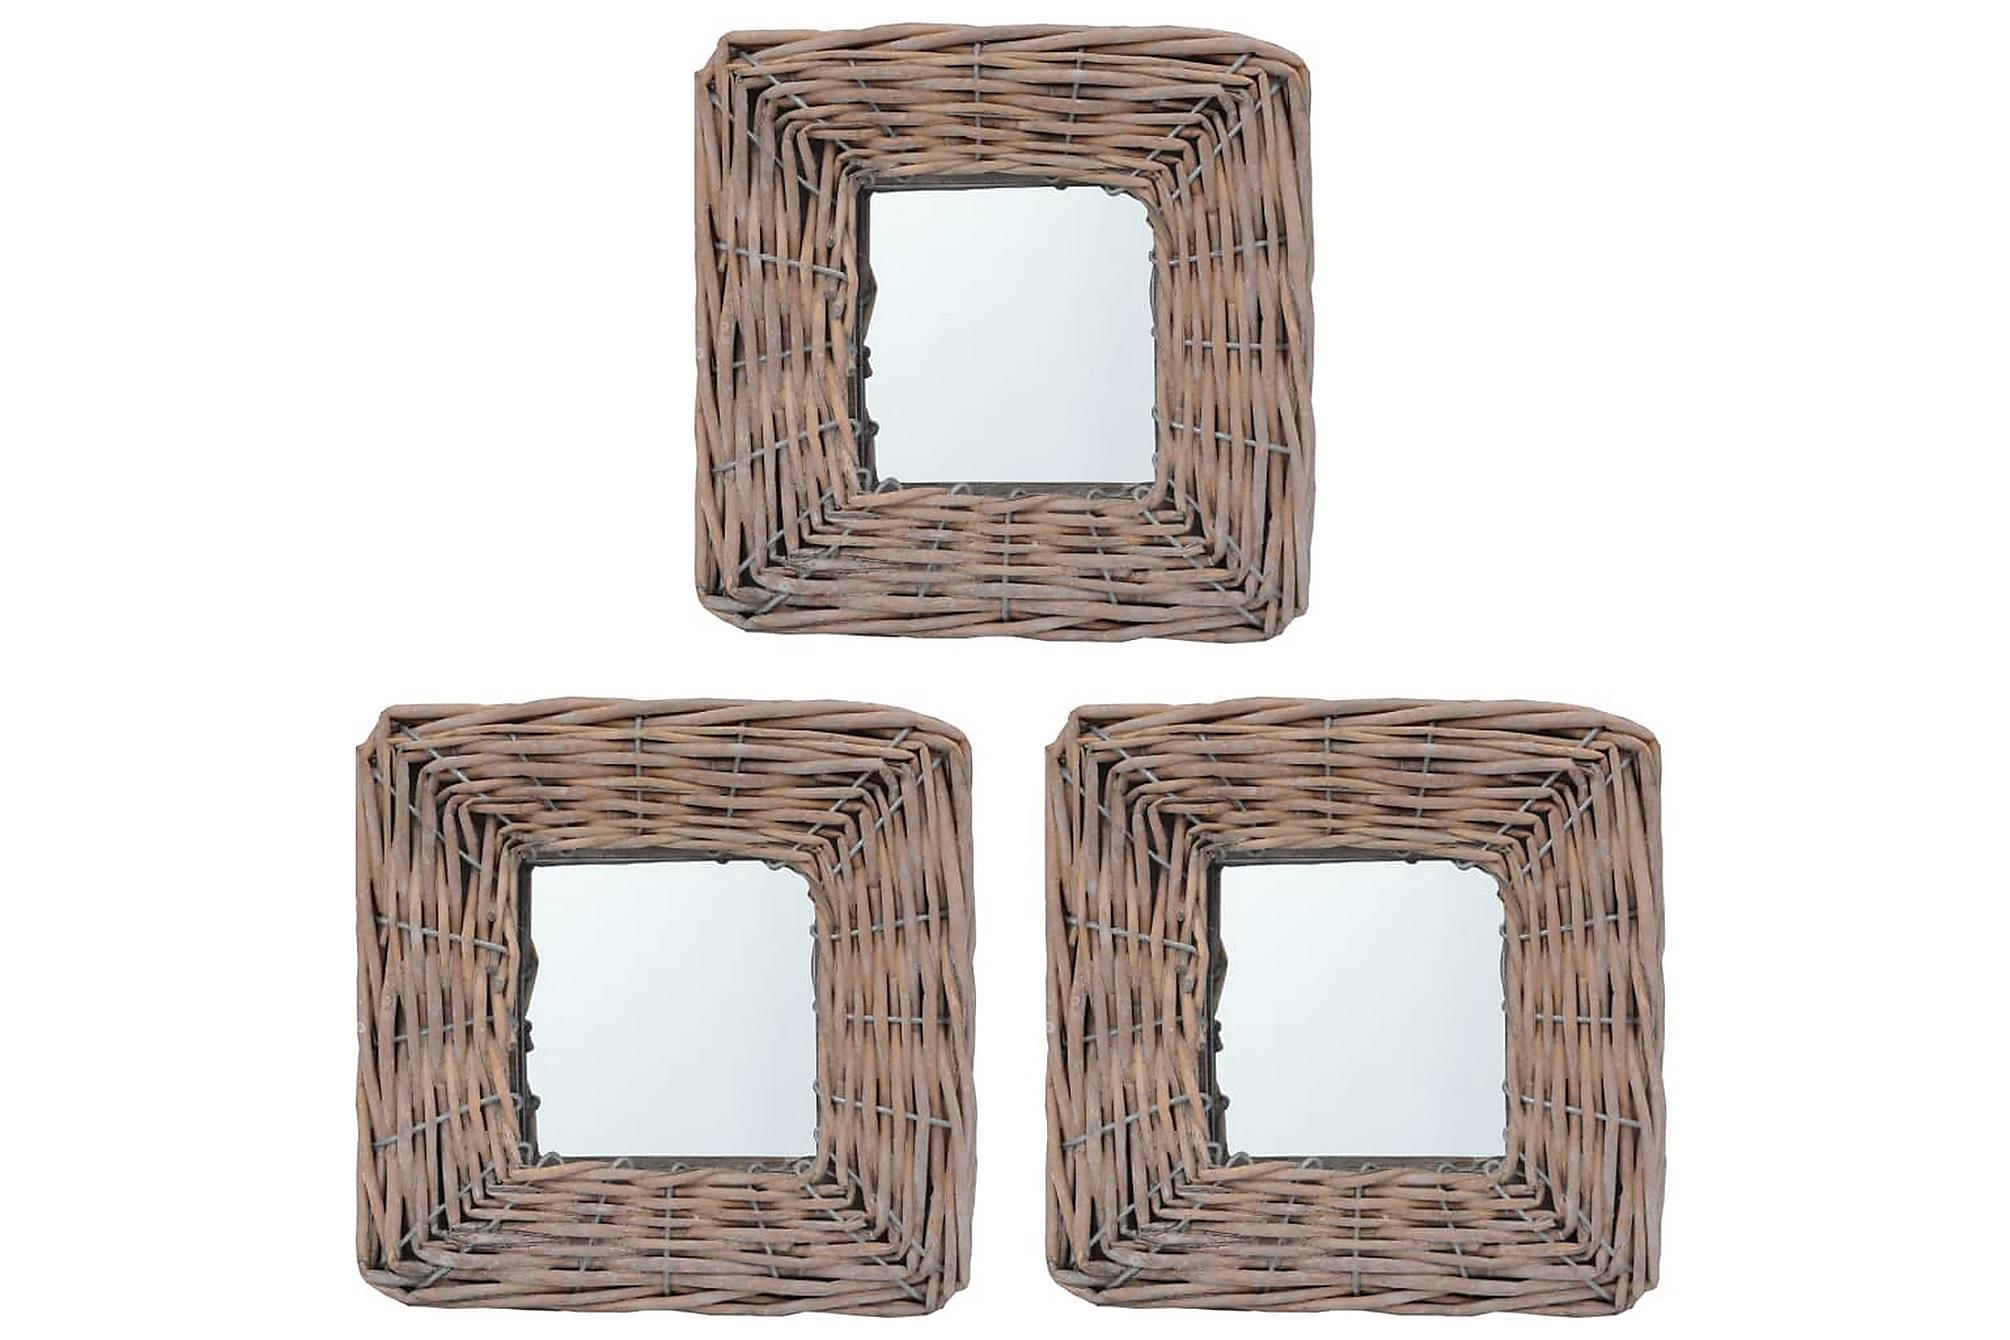 Spegel 3 st 15x15 cm korgmaterial